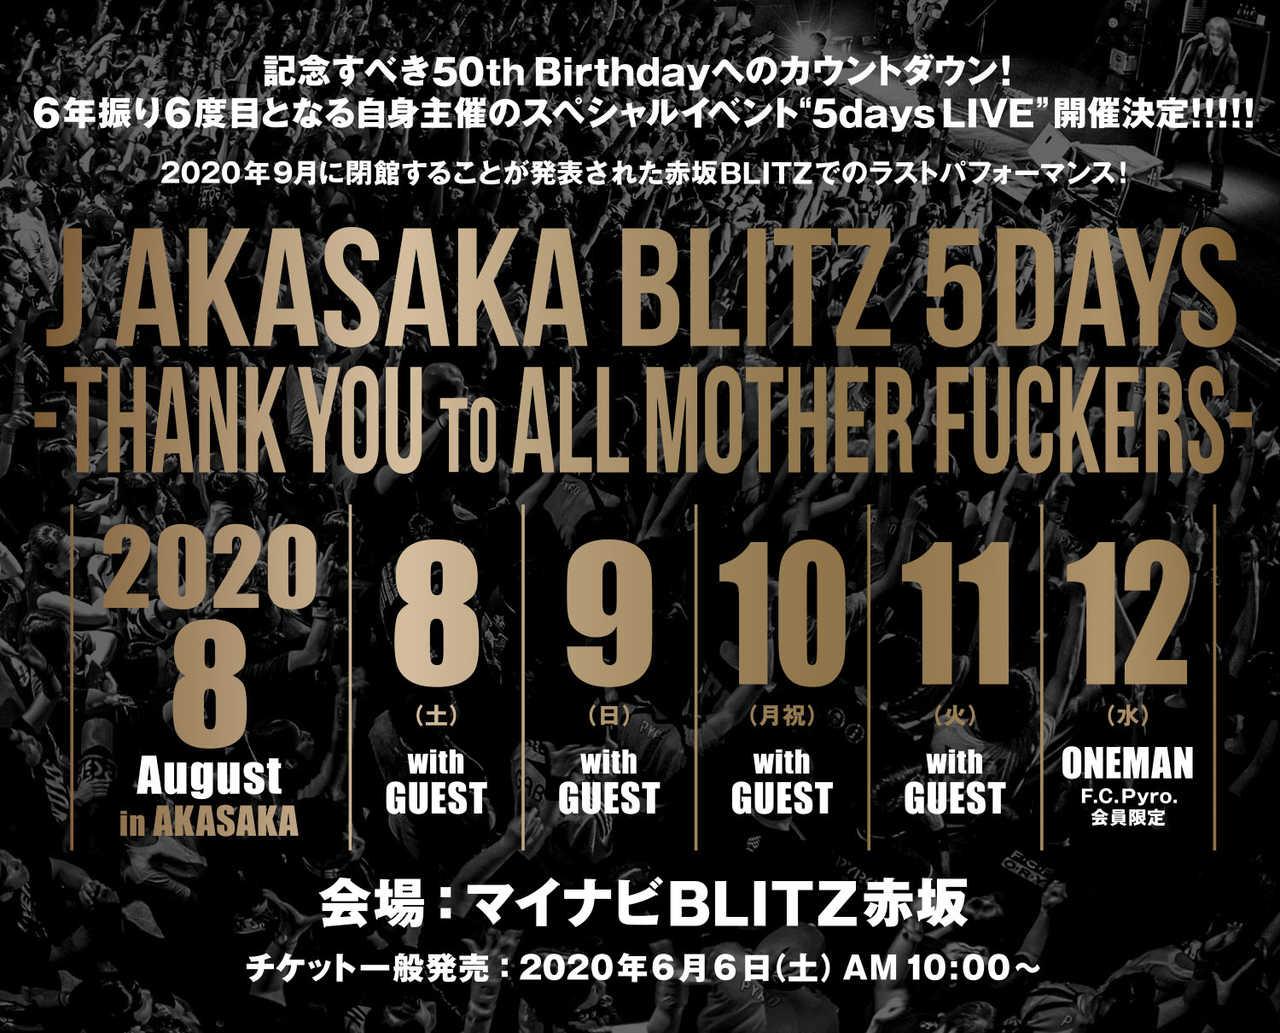 『J AKASAKA BLITZ 5DAYS -THANK YOU TO ALL MOTHER FUCKERS-』